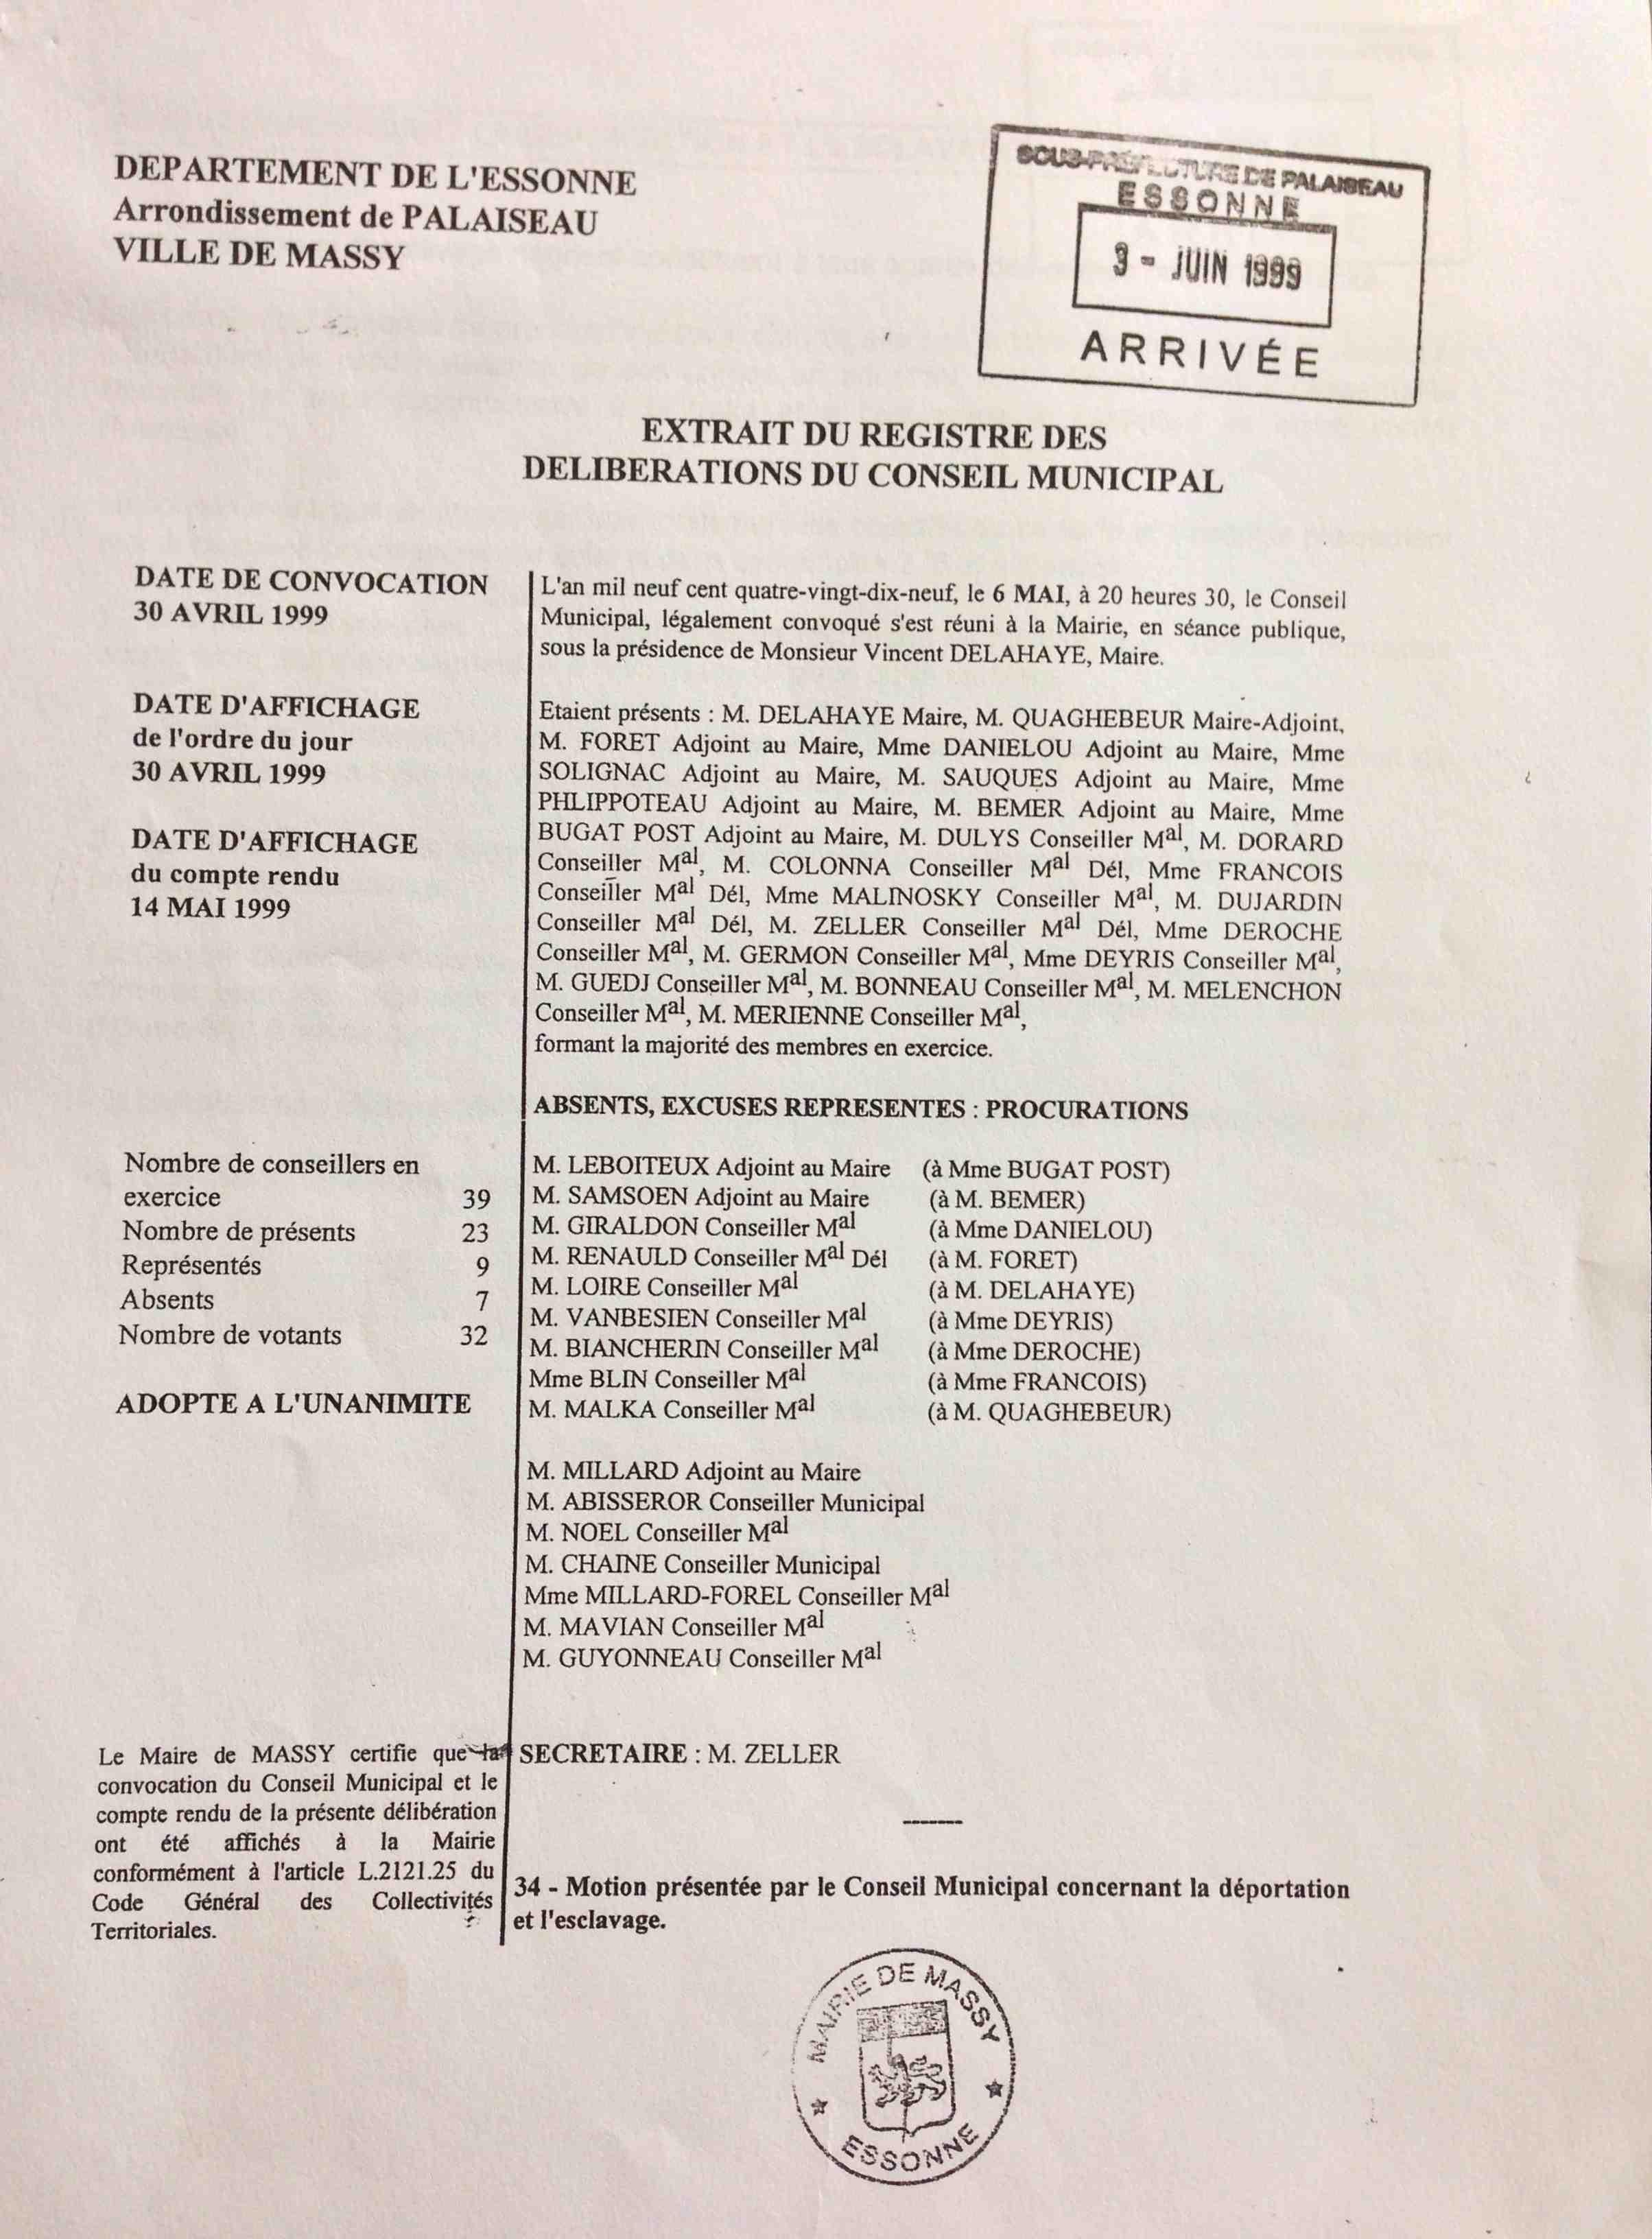 deliberation du conseil municipal du 6 mai 1999 - 1